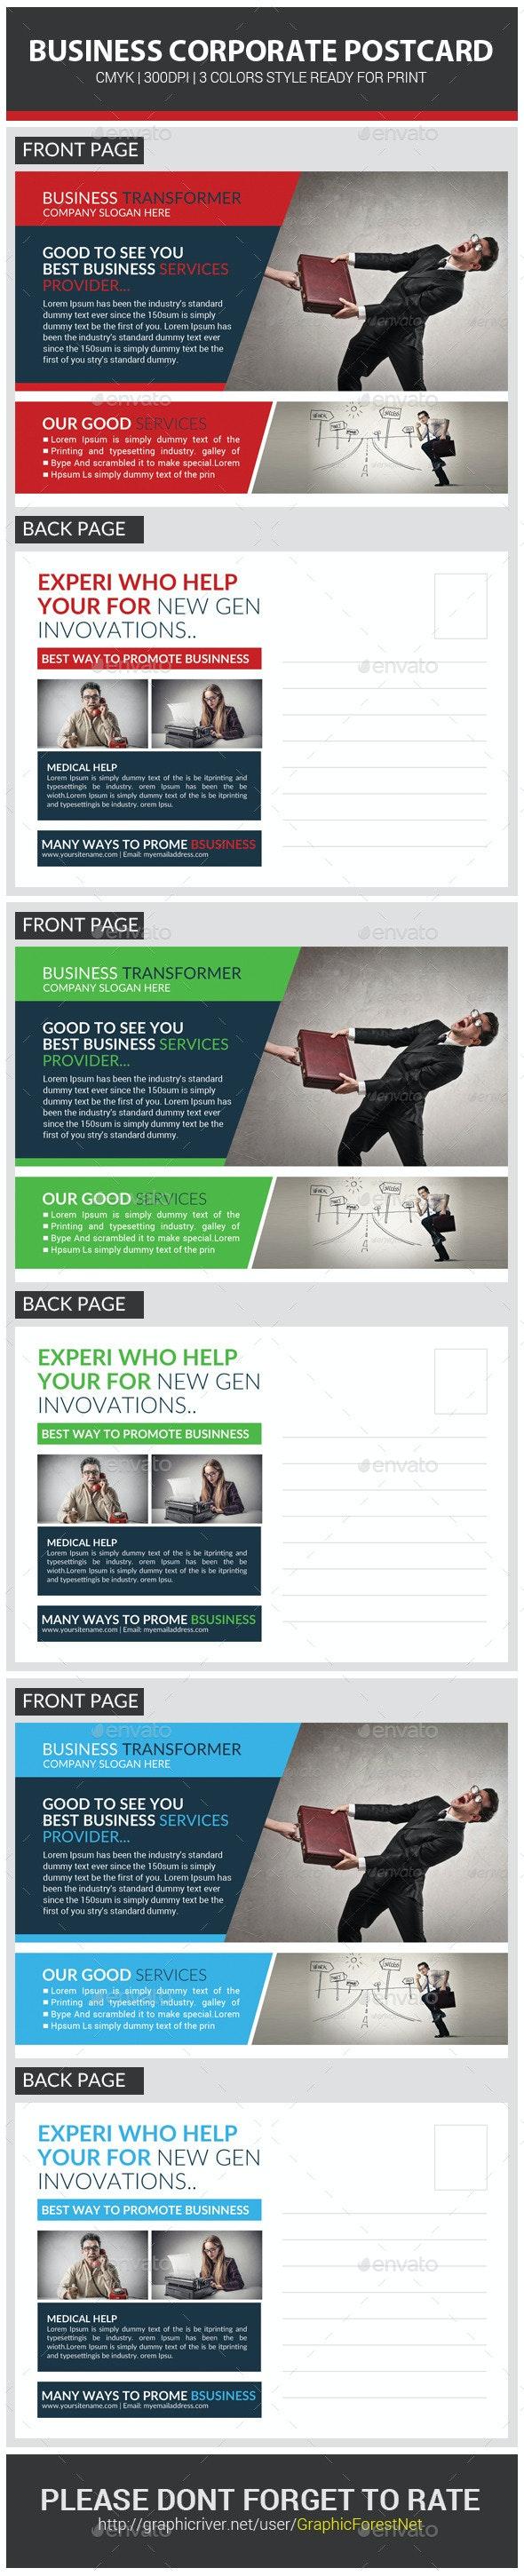 Corporate Business Postcard Template - Cards & Invites Print Templates